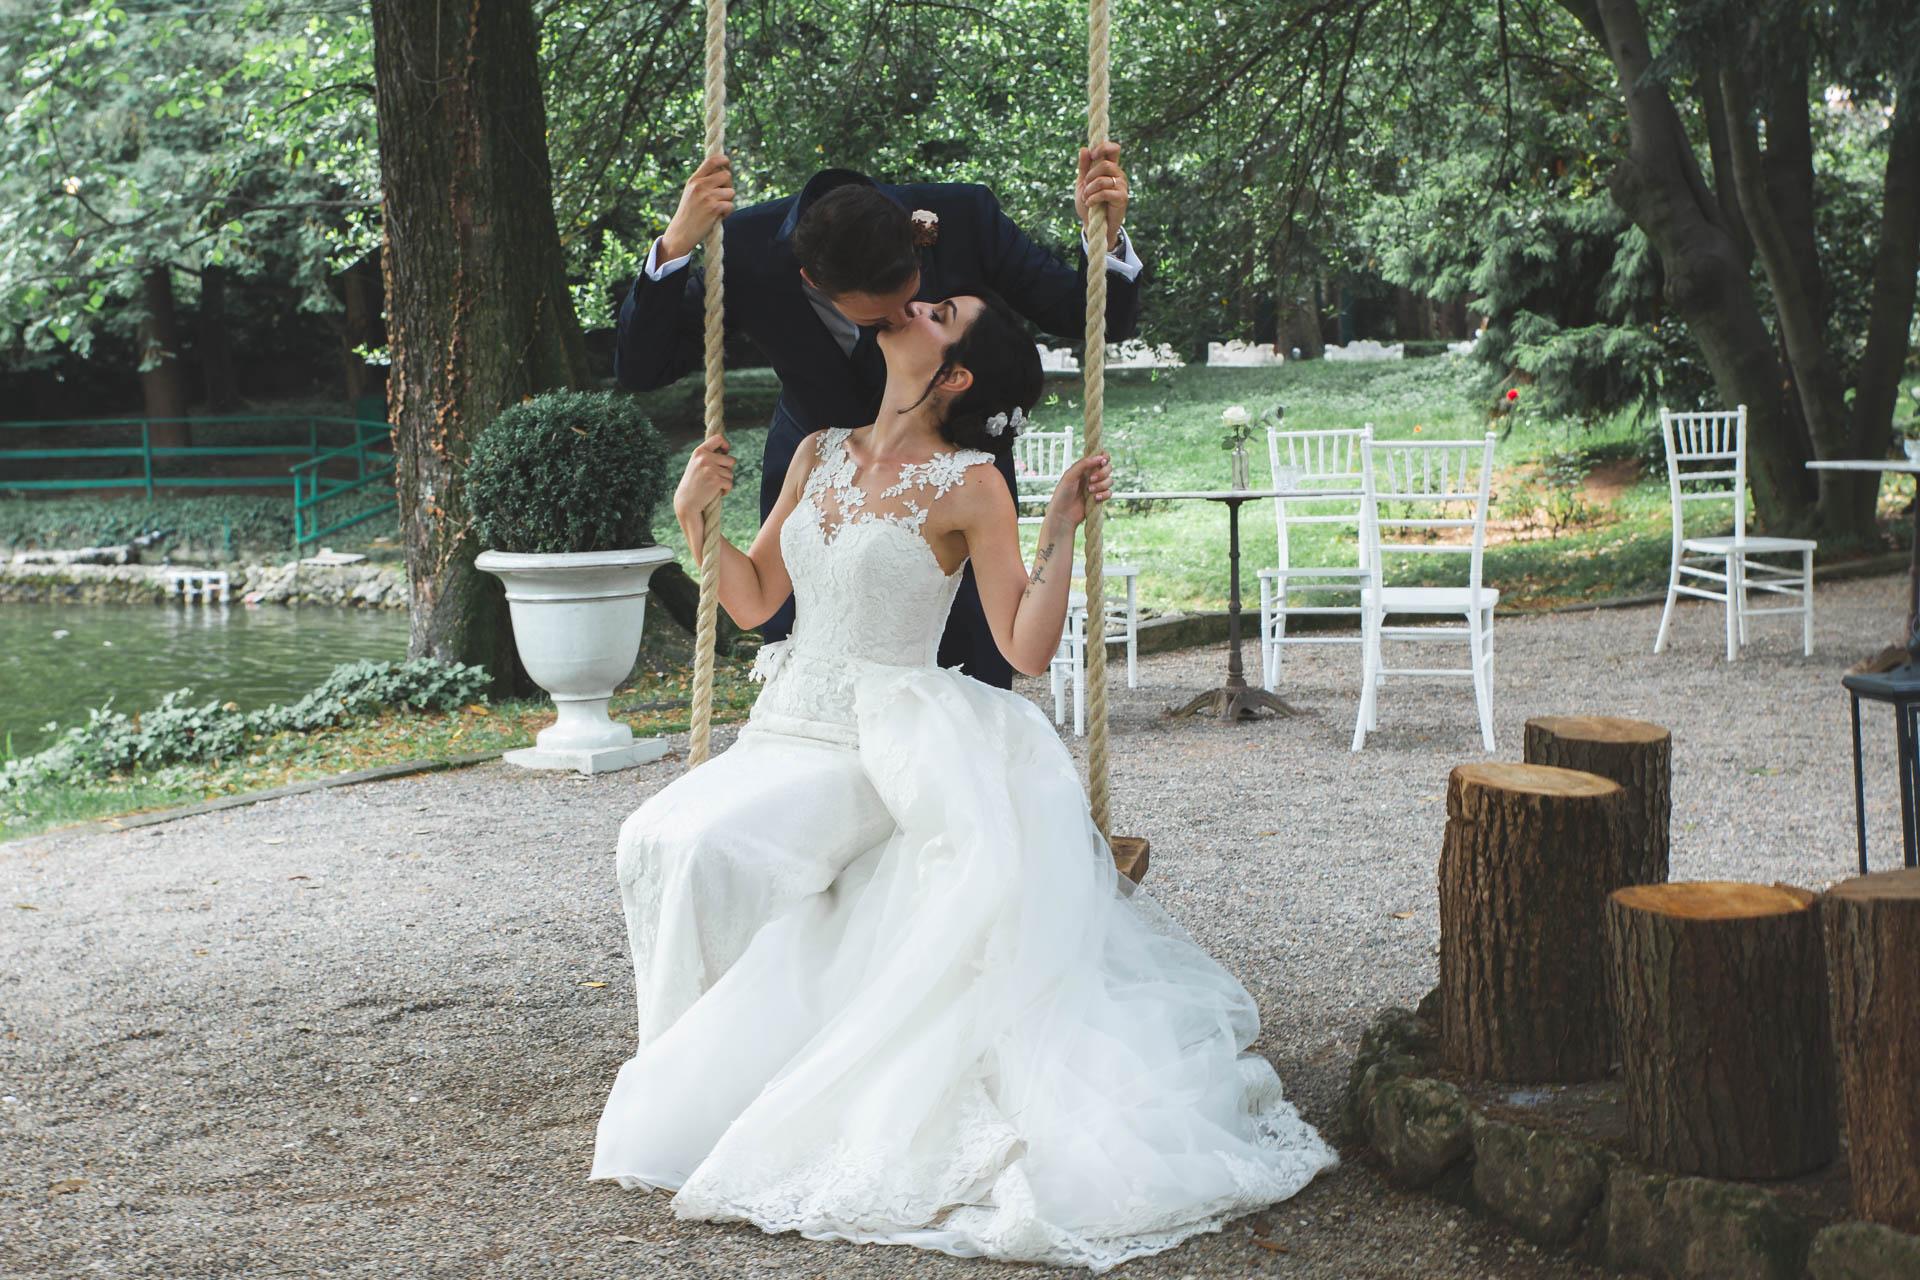 sposi bacio altalena